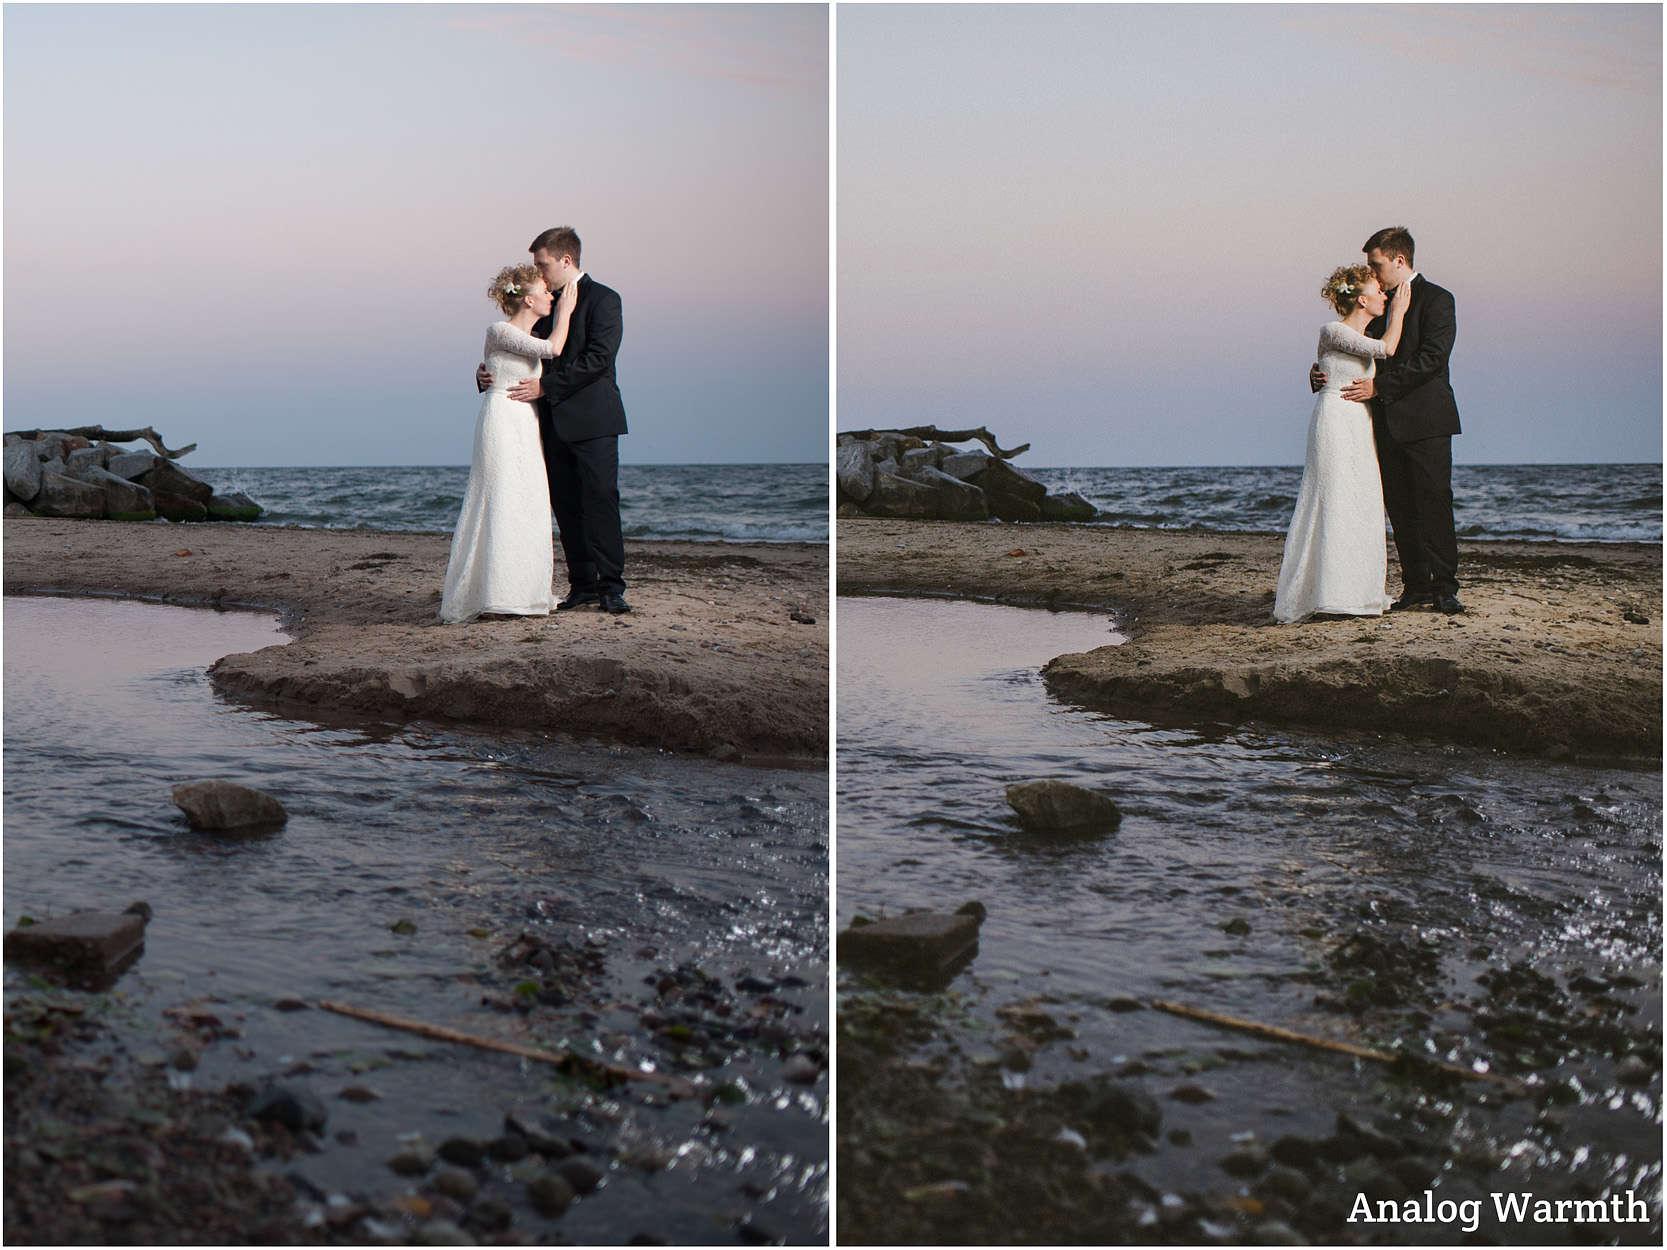 Presety BW do Adobe Lightroom i Adobe Camera RAW - ACR Delicious Presets